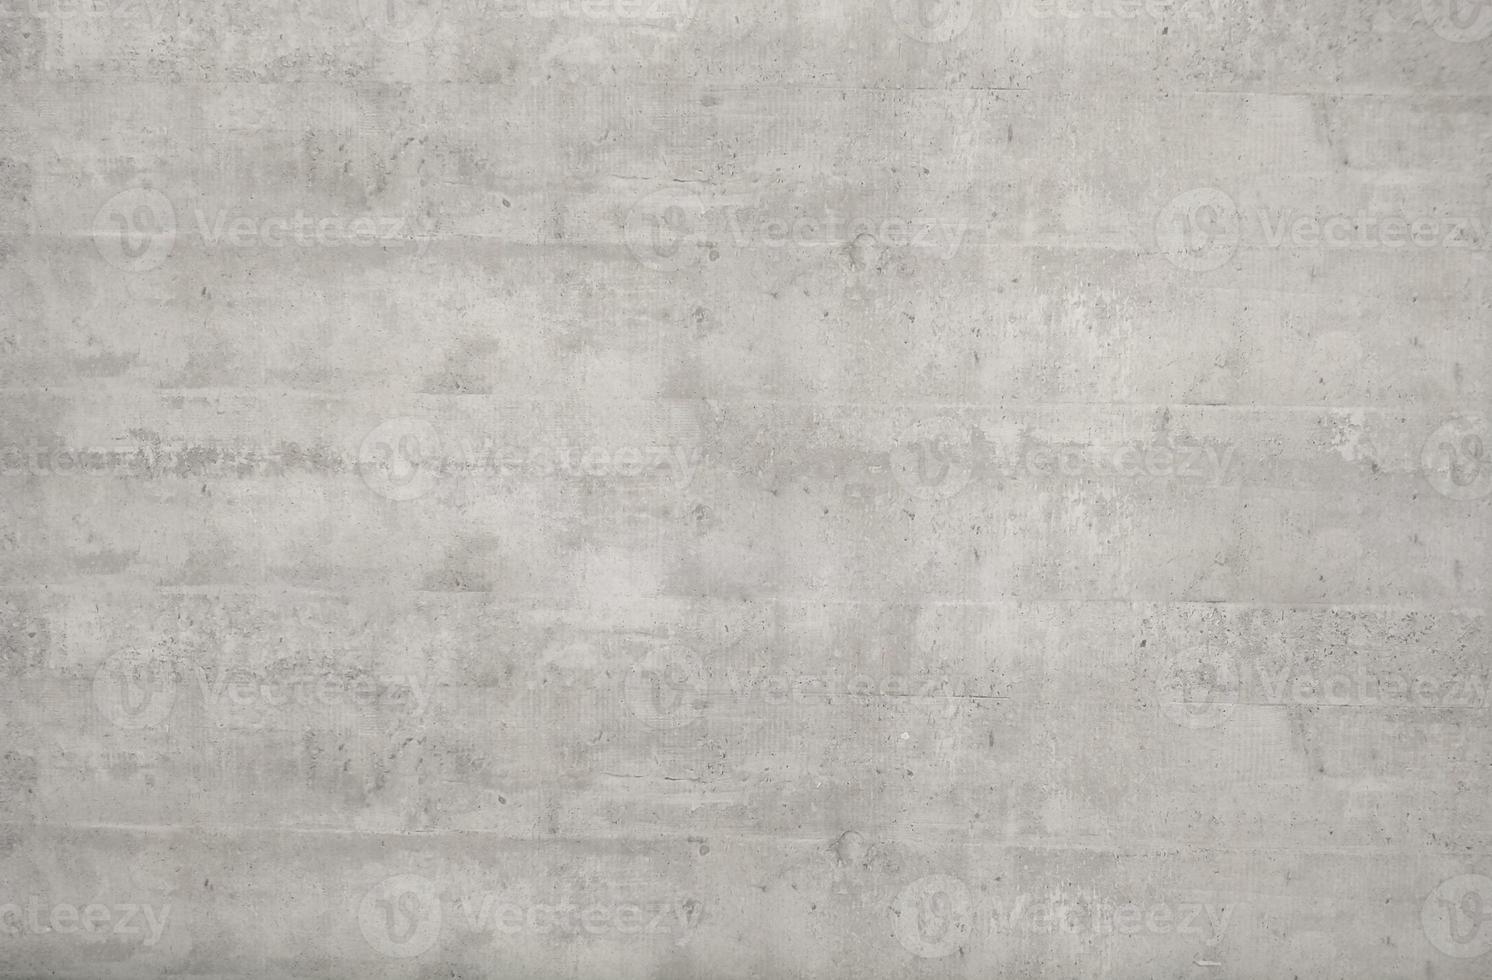 Fondo de textura de hormigón blanco de cemento natural o piedra textura antiguaadsf foto